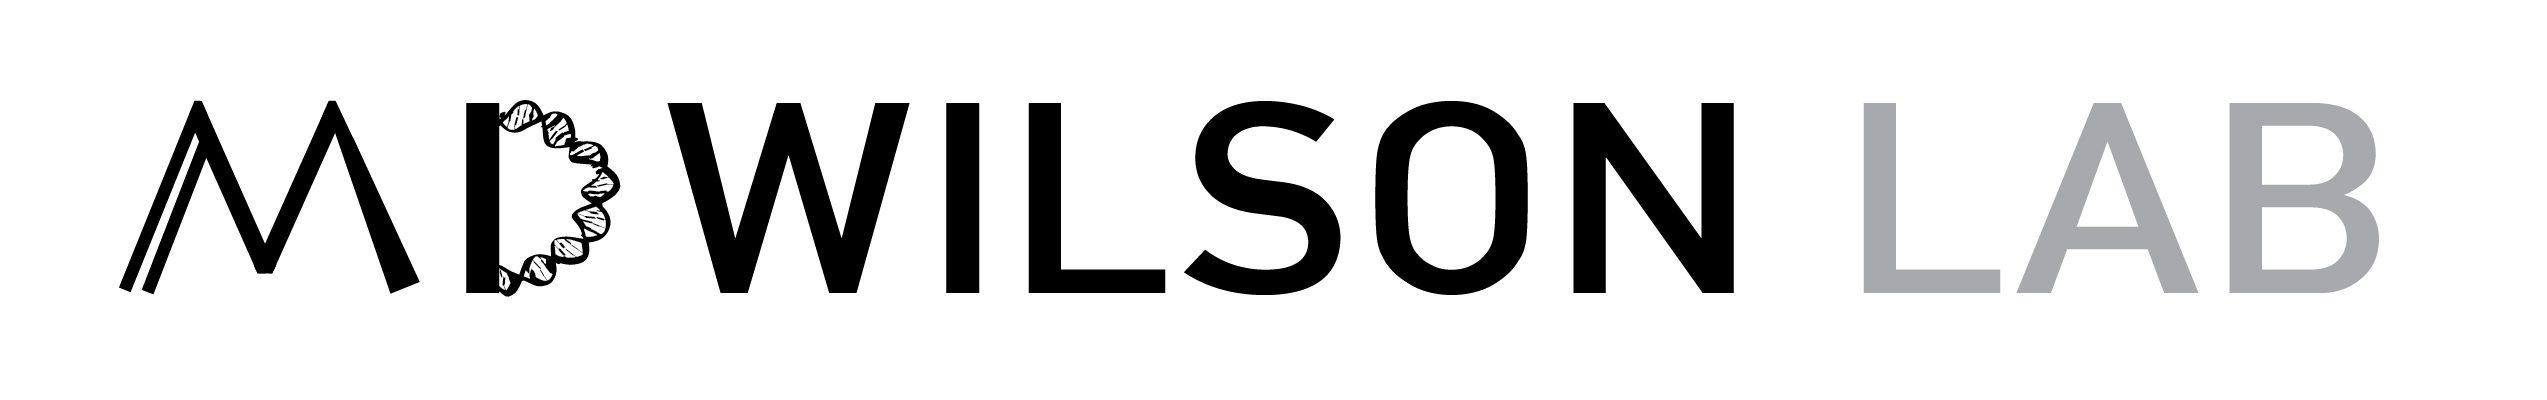 M D Wilson lab